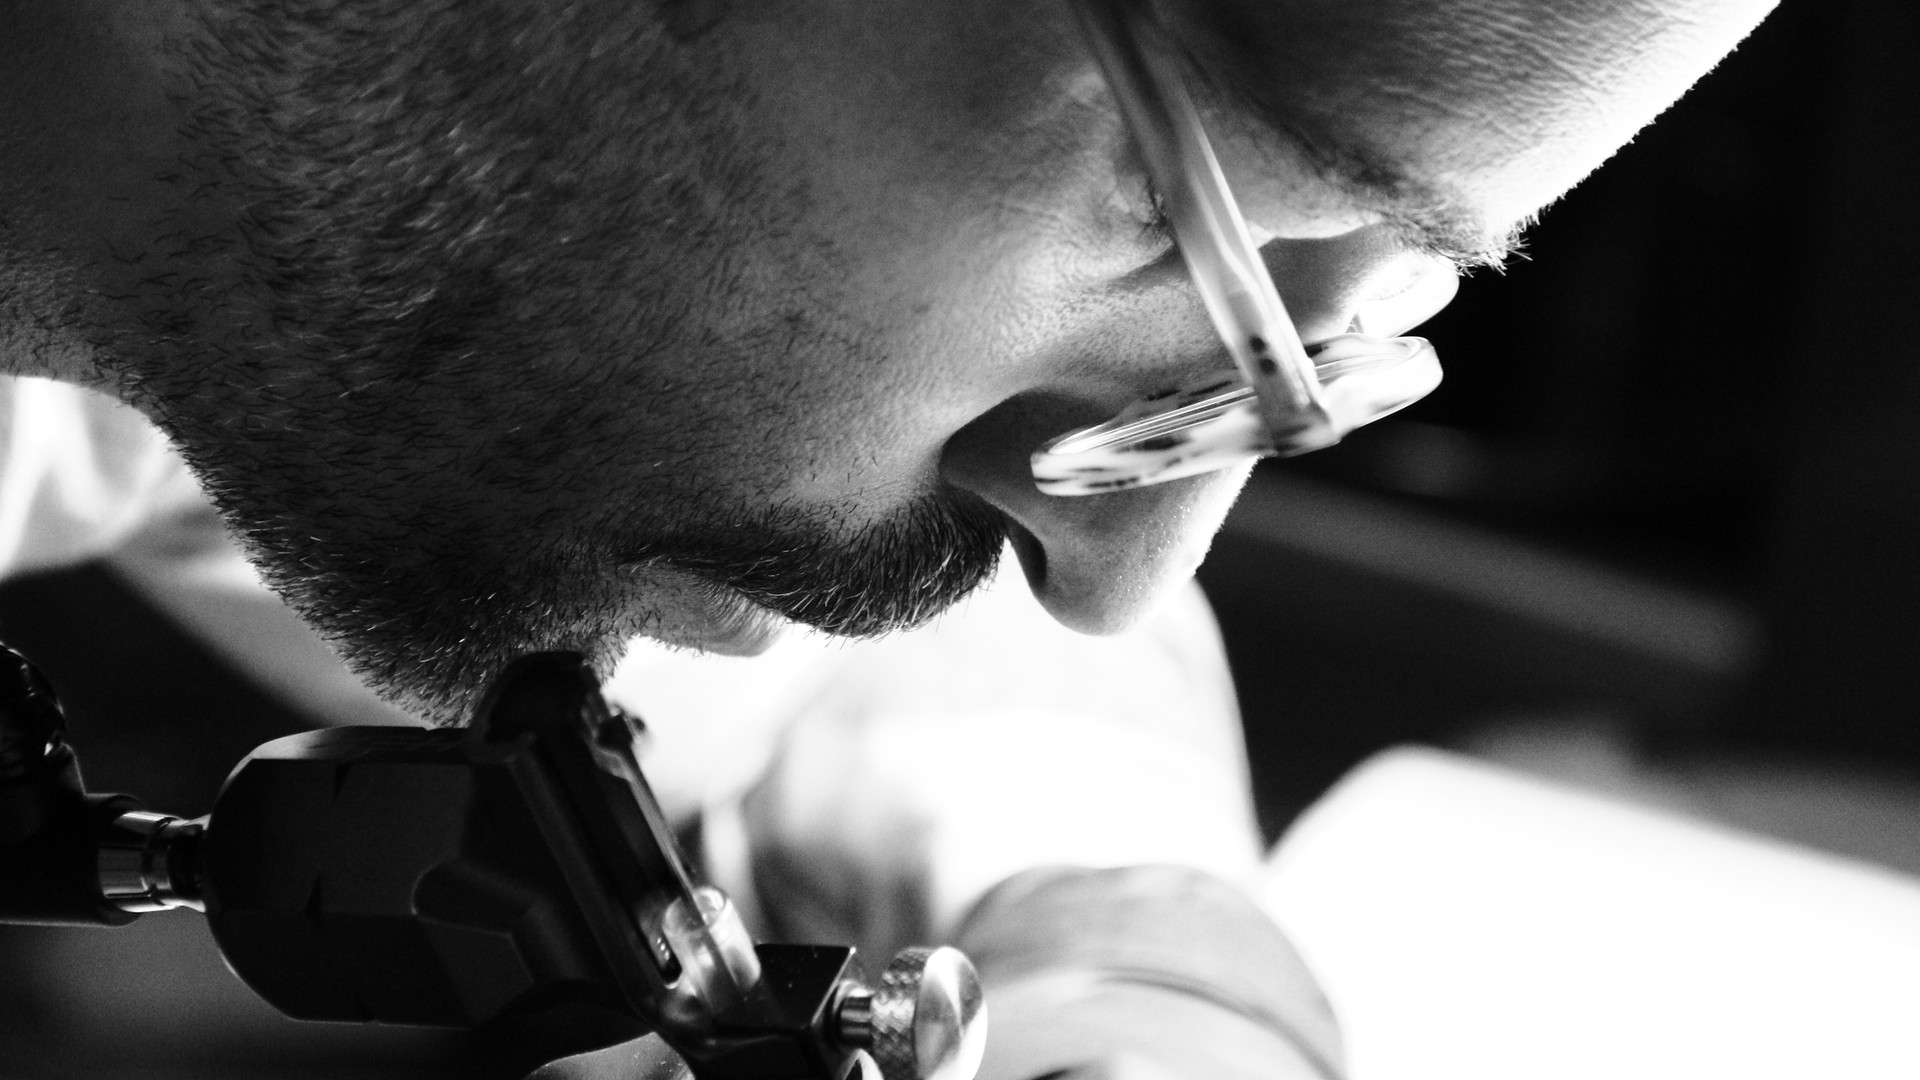 frederic-agid-tatoueur-paris-therapie.jpg